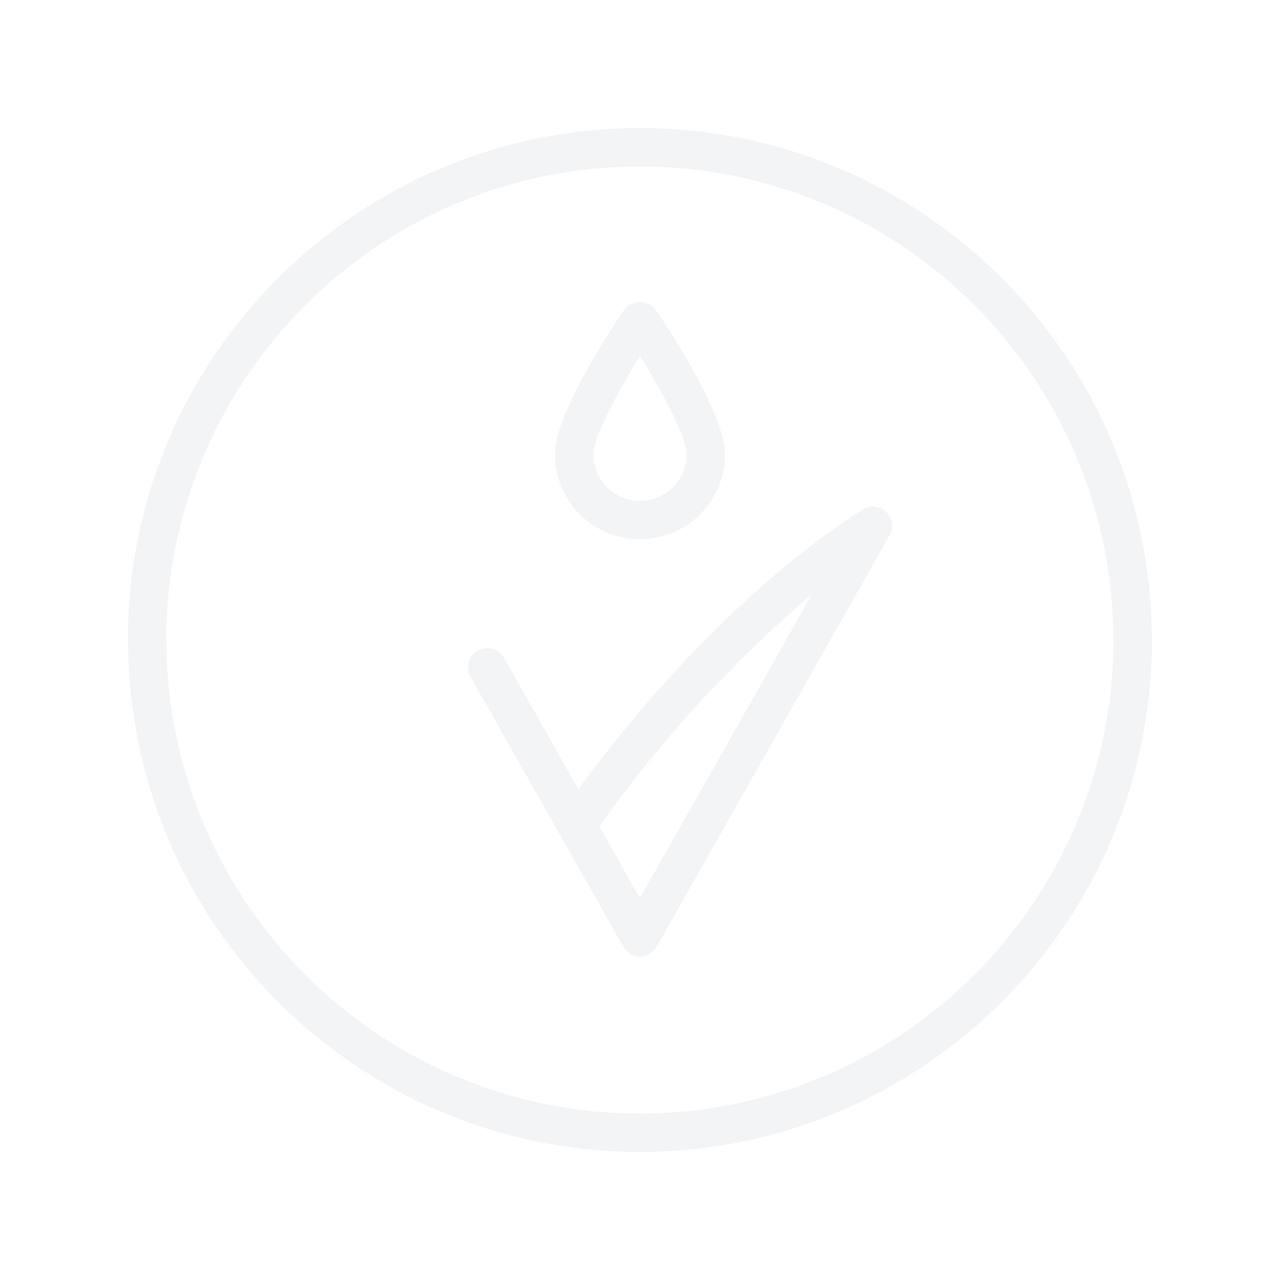 WELLA PROFESSIONALS Sp Reverse Regenerating Shampoo 200ml